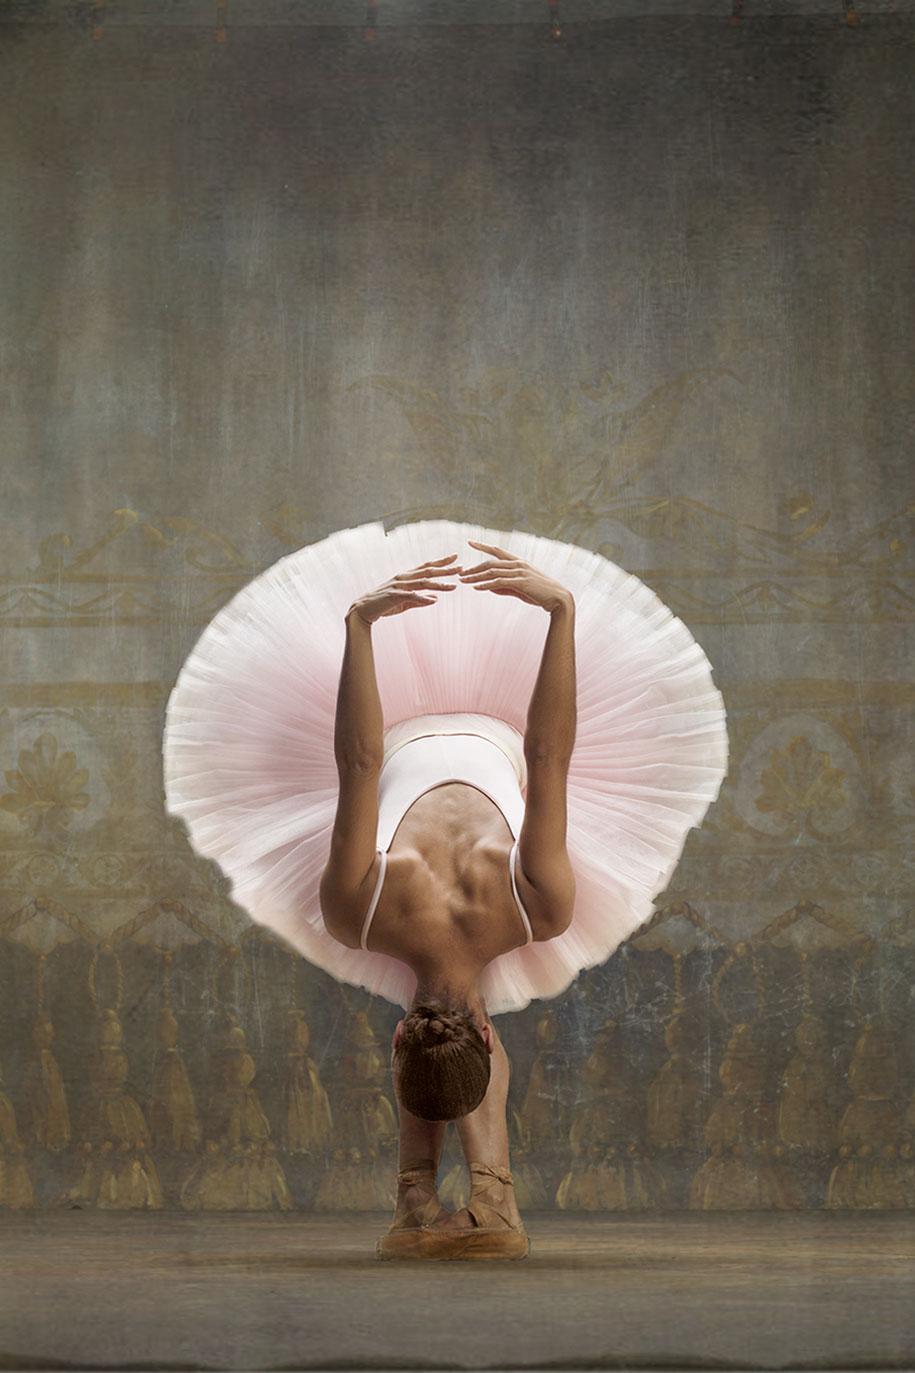 dipinti-danza-edgar-degas-fotografia-misty-copeland-6